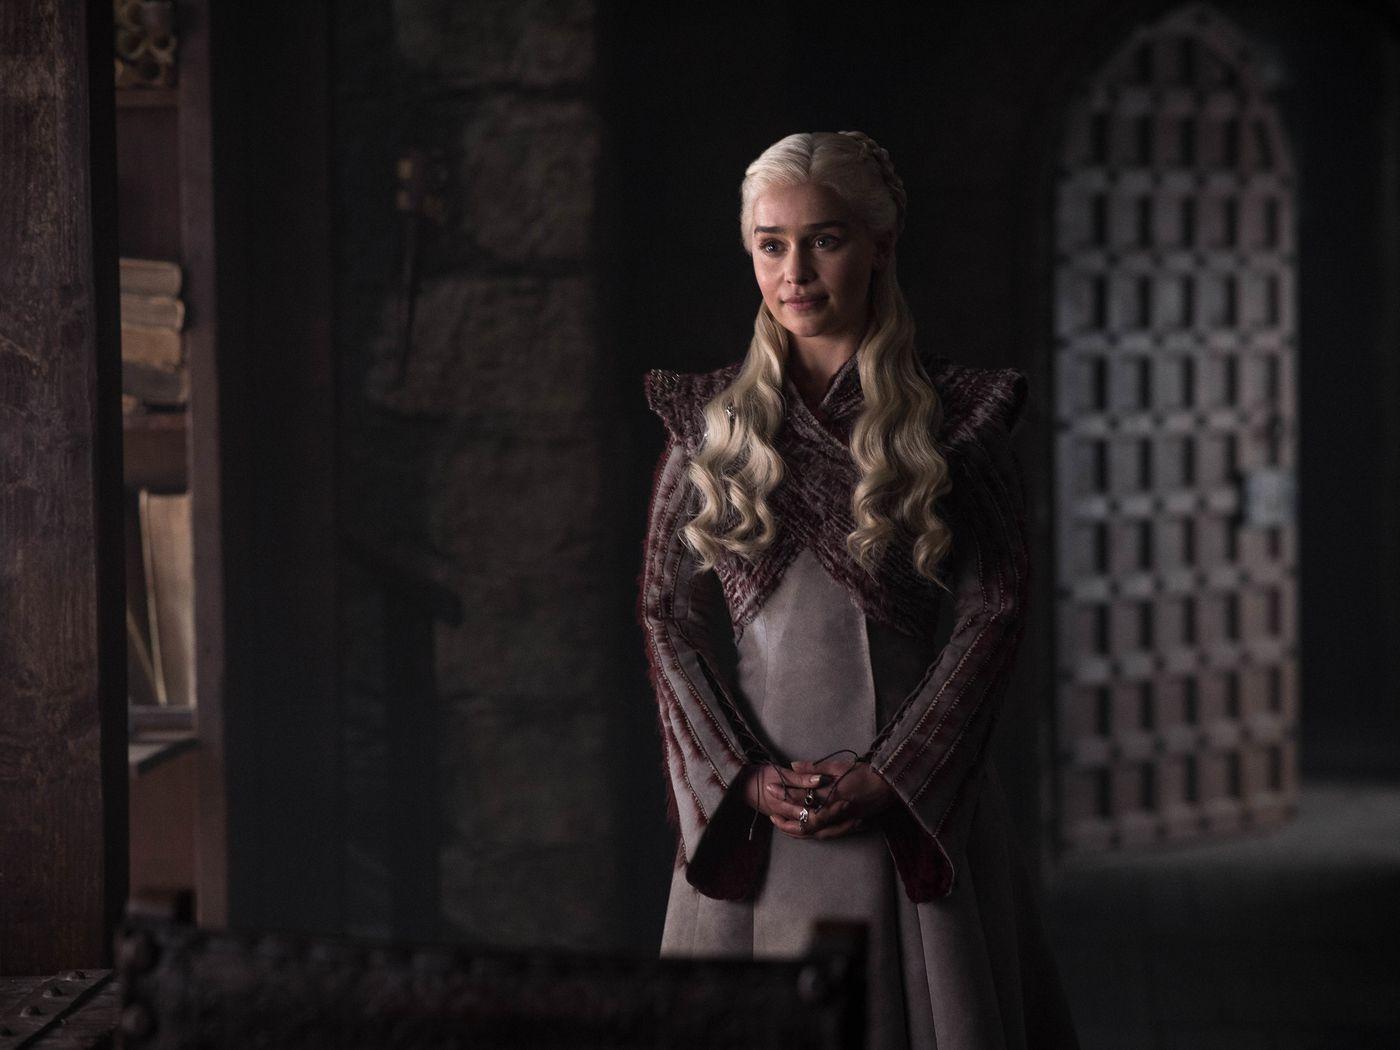 free download game of thrones season 4 episode 5